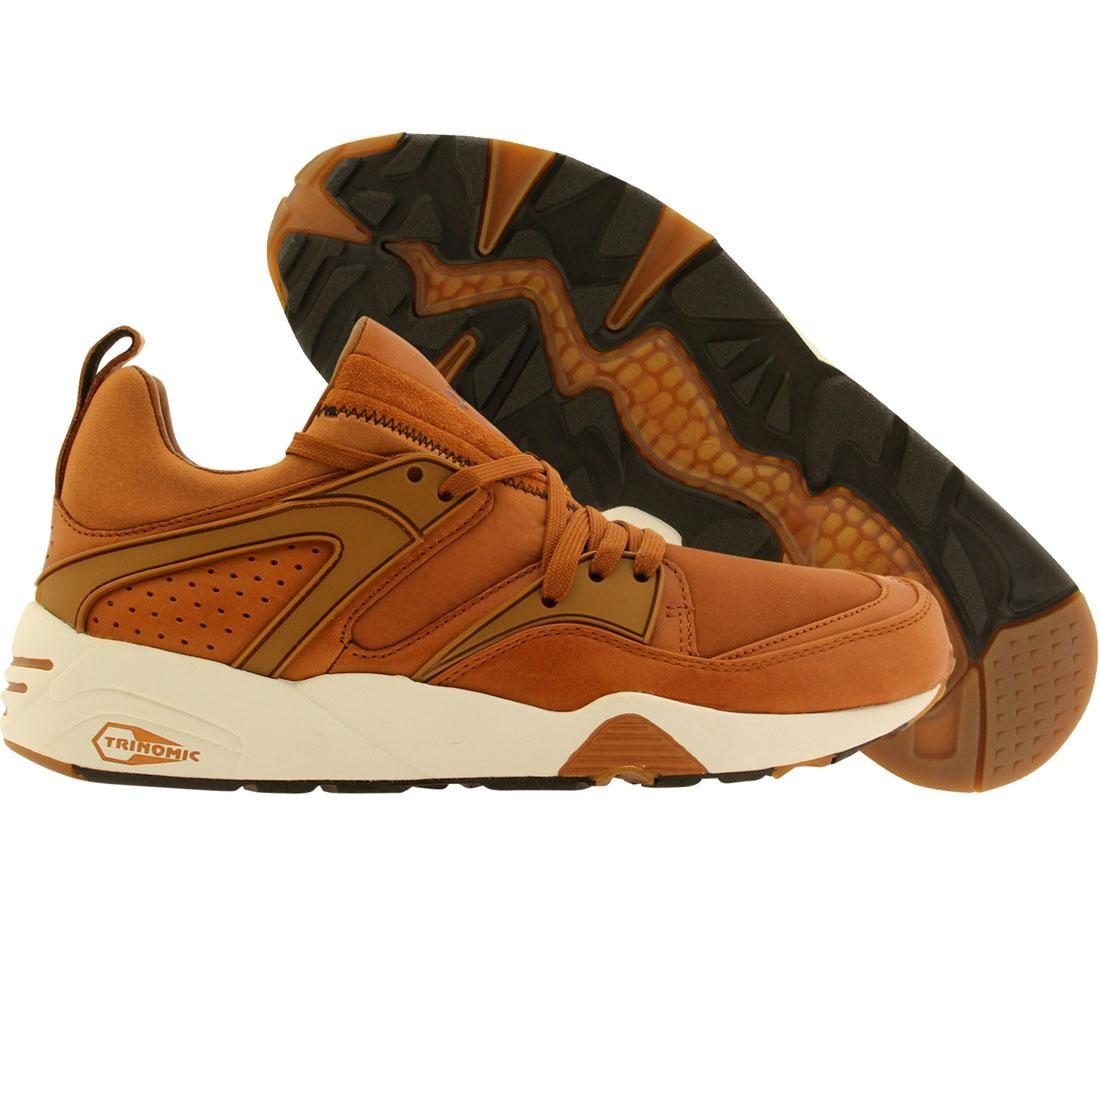 Puma Men Trinomic Blaze Of Glory NL brown nubuck leather